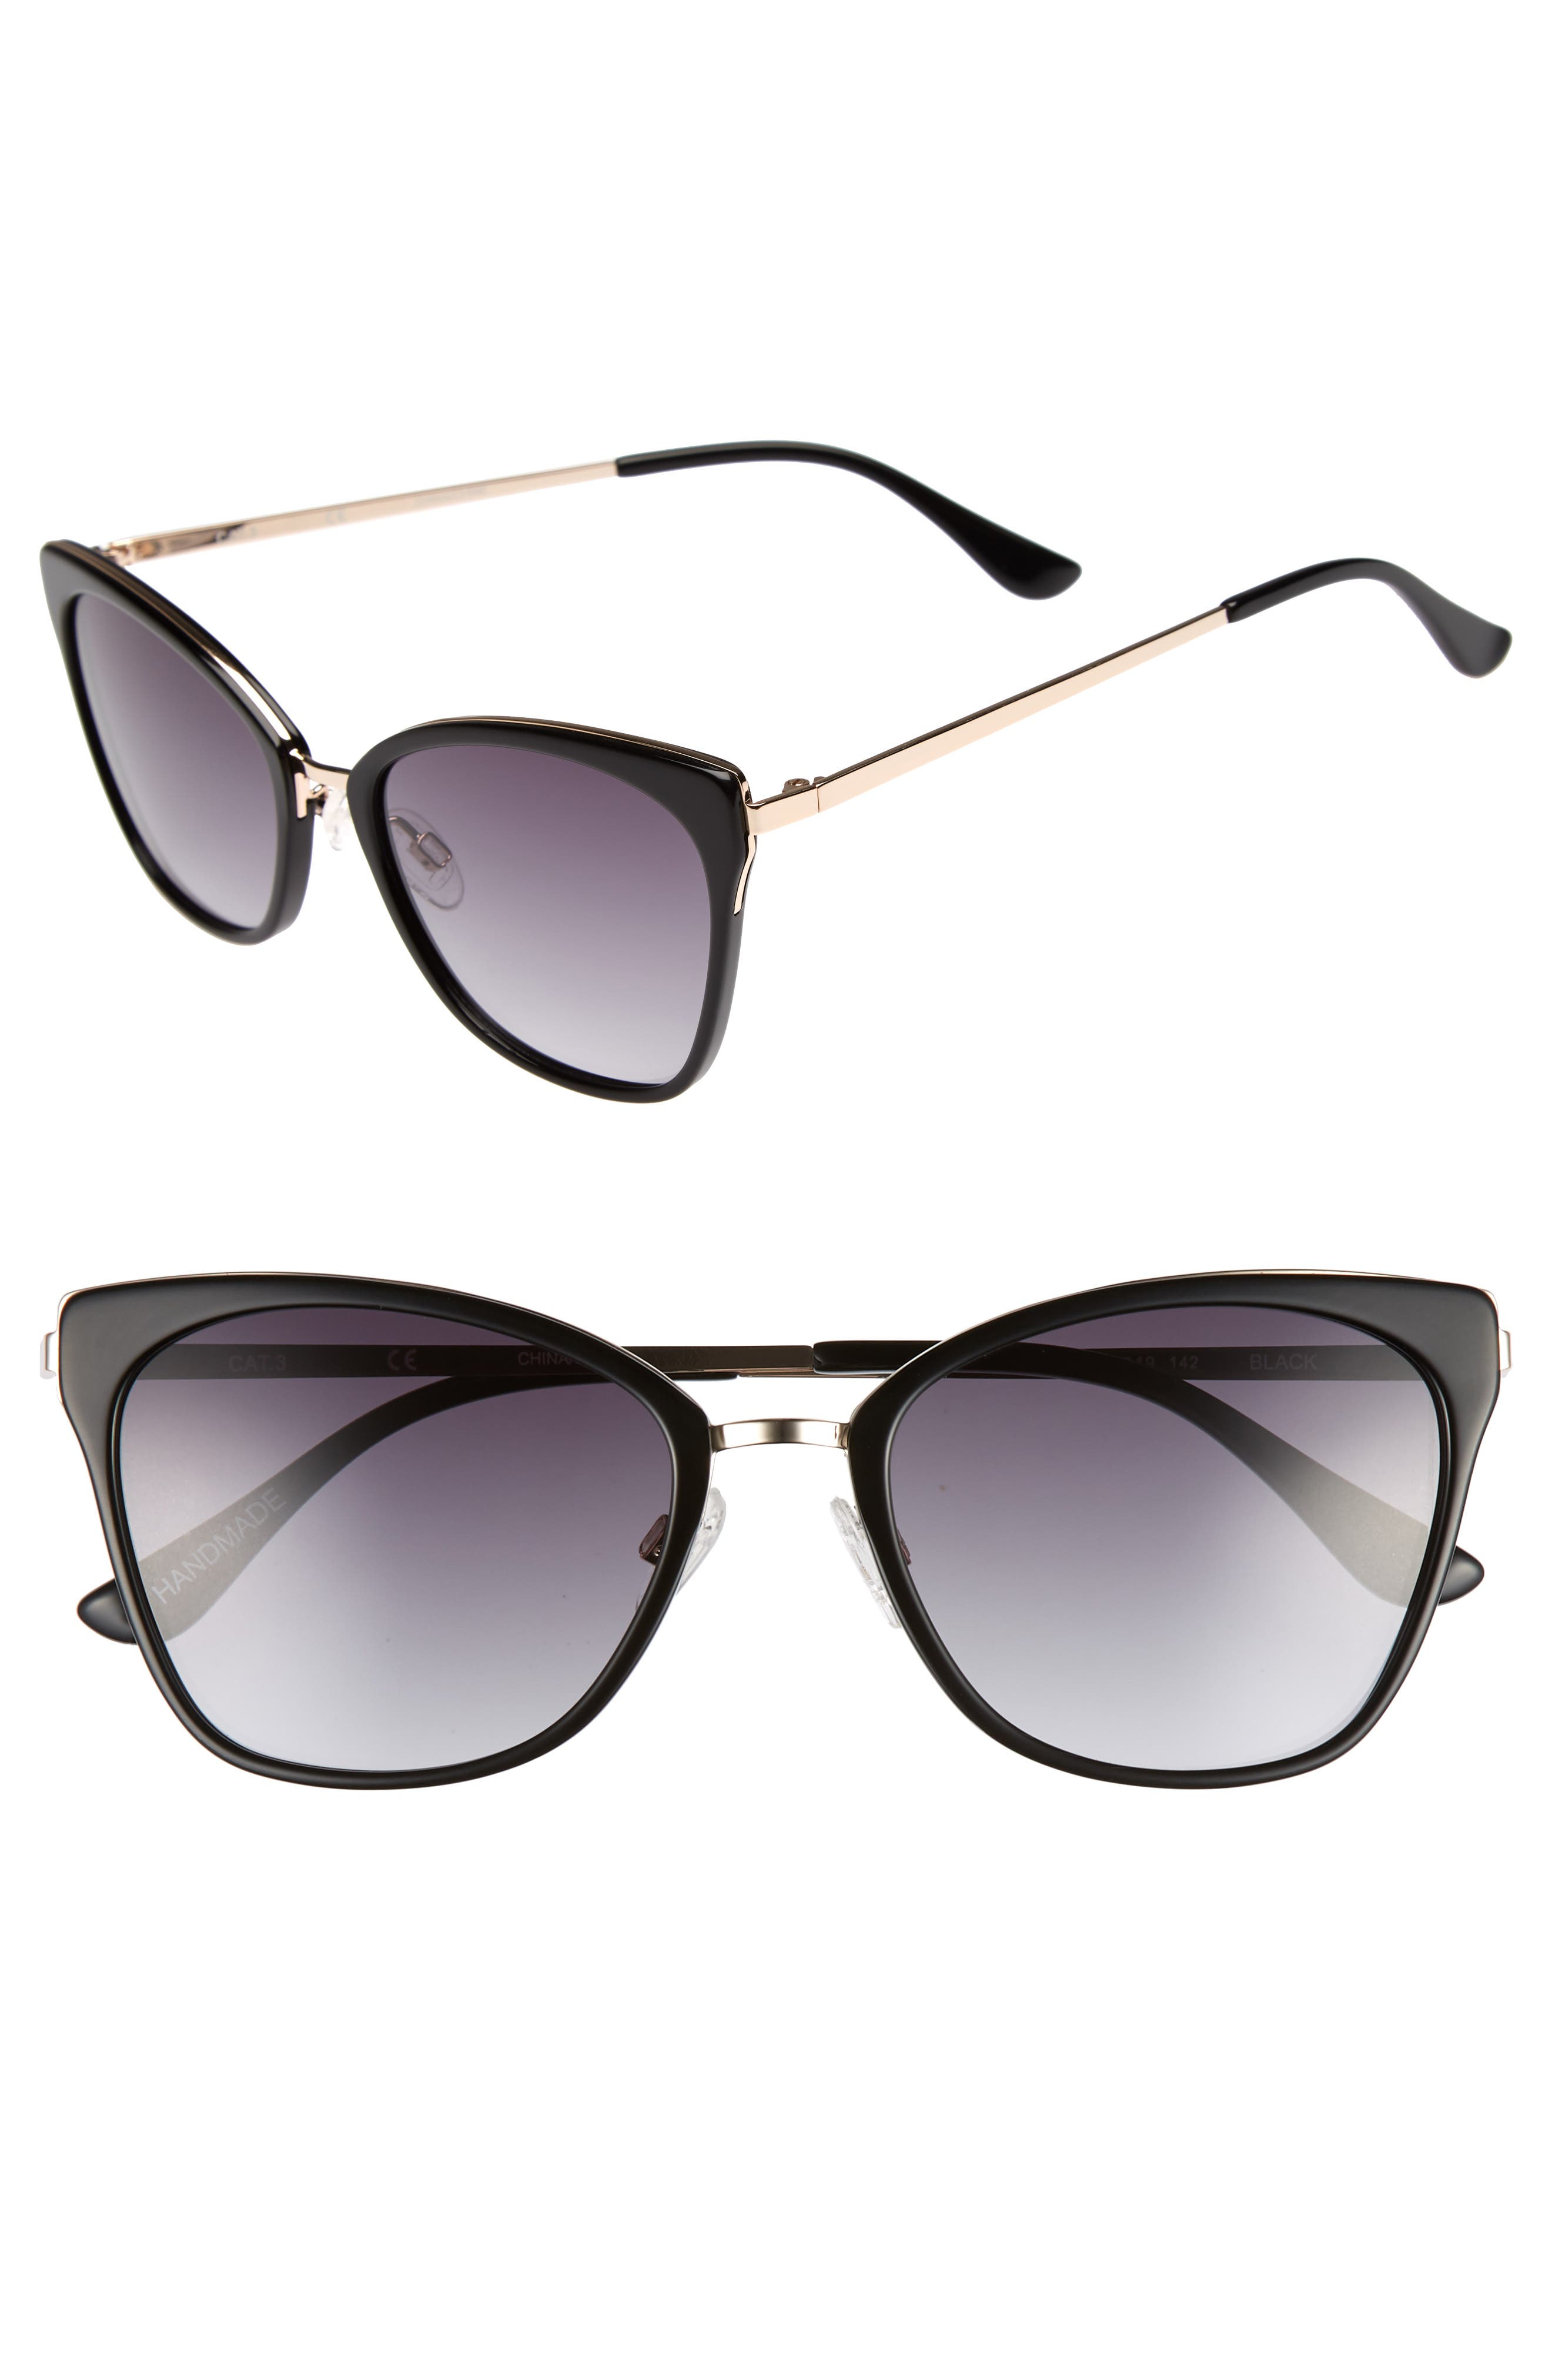 Origami 55mm Cat Eye Sunglasses,                             Main thumbnail 1, color,                             Black